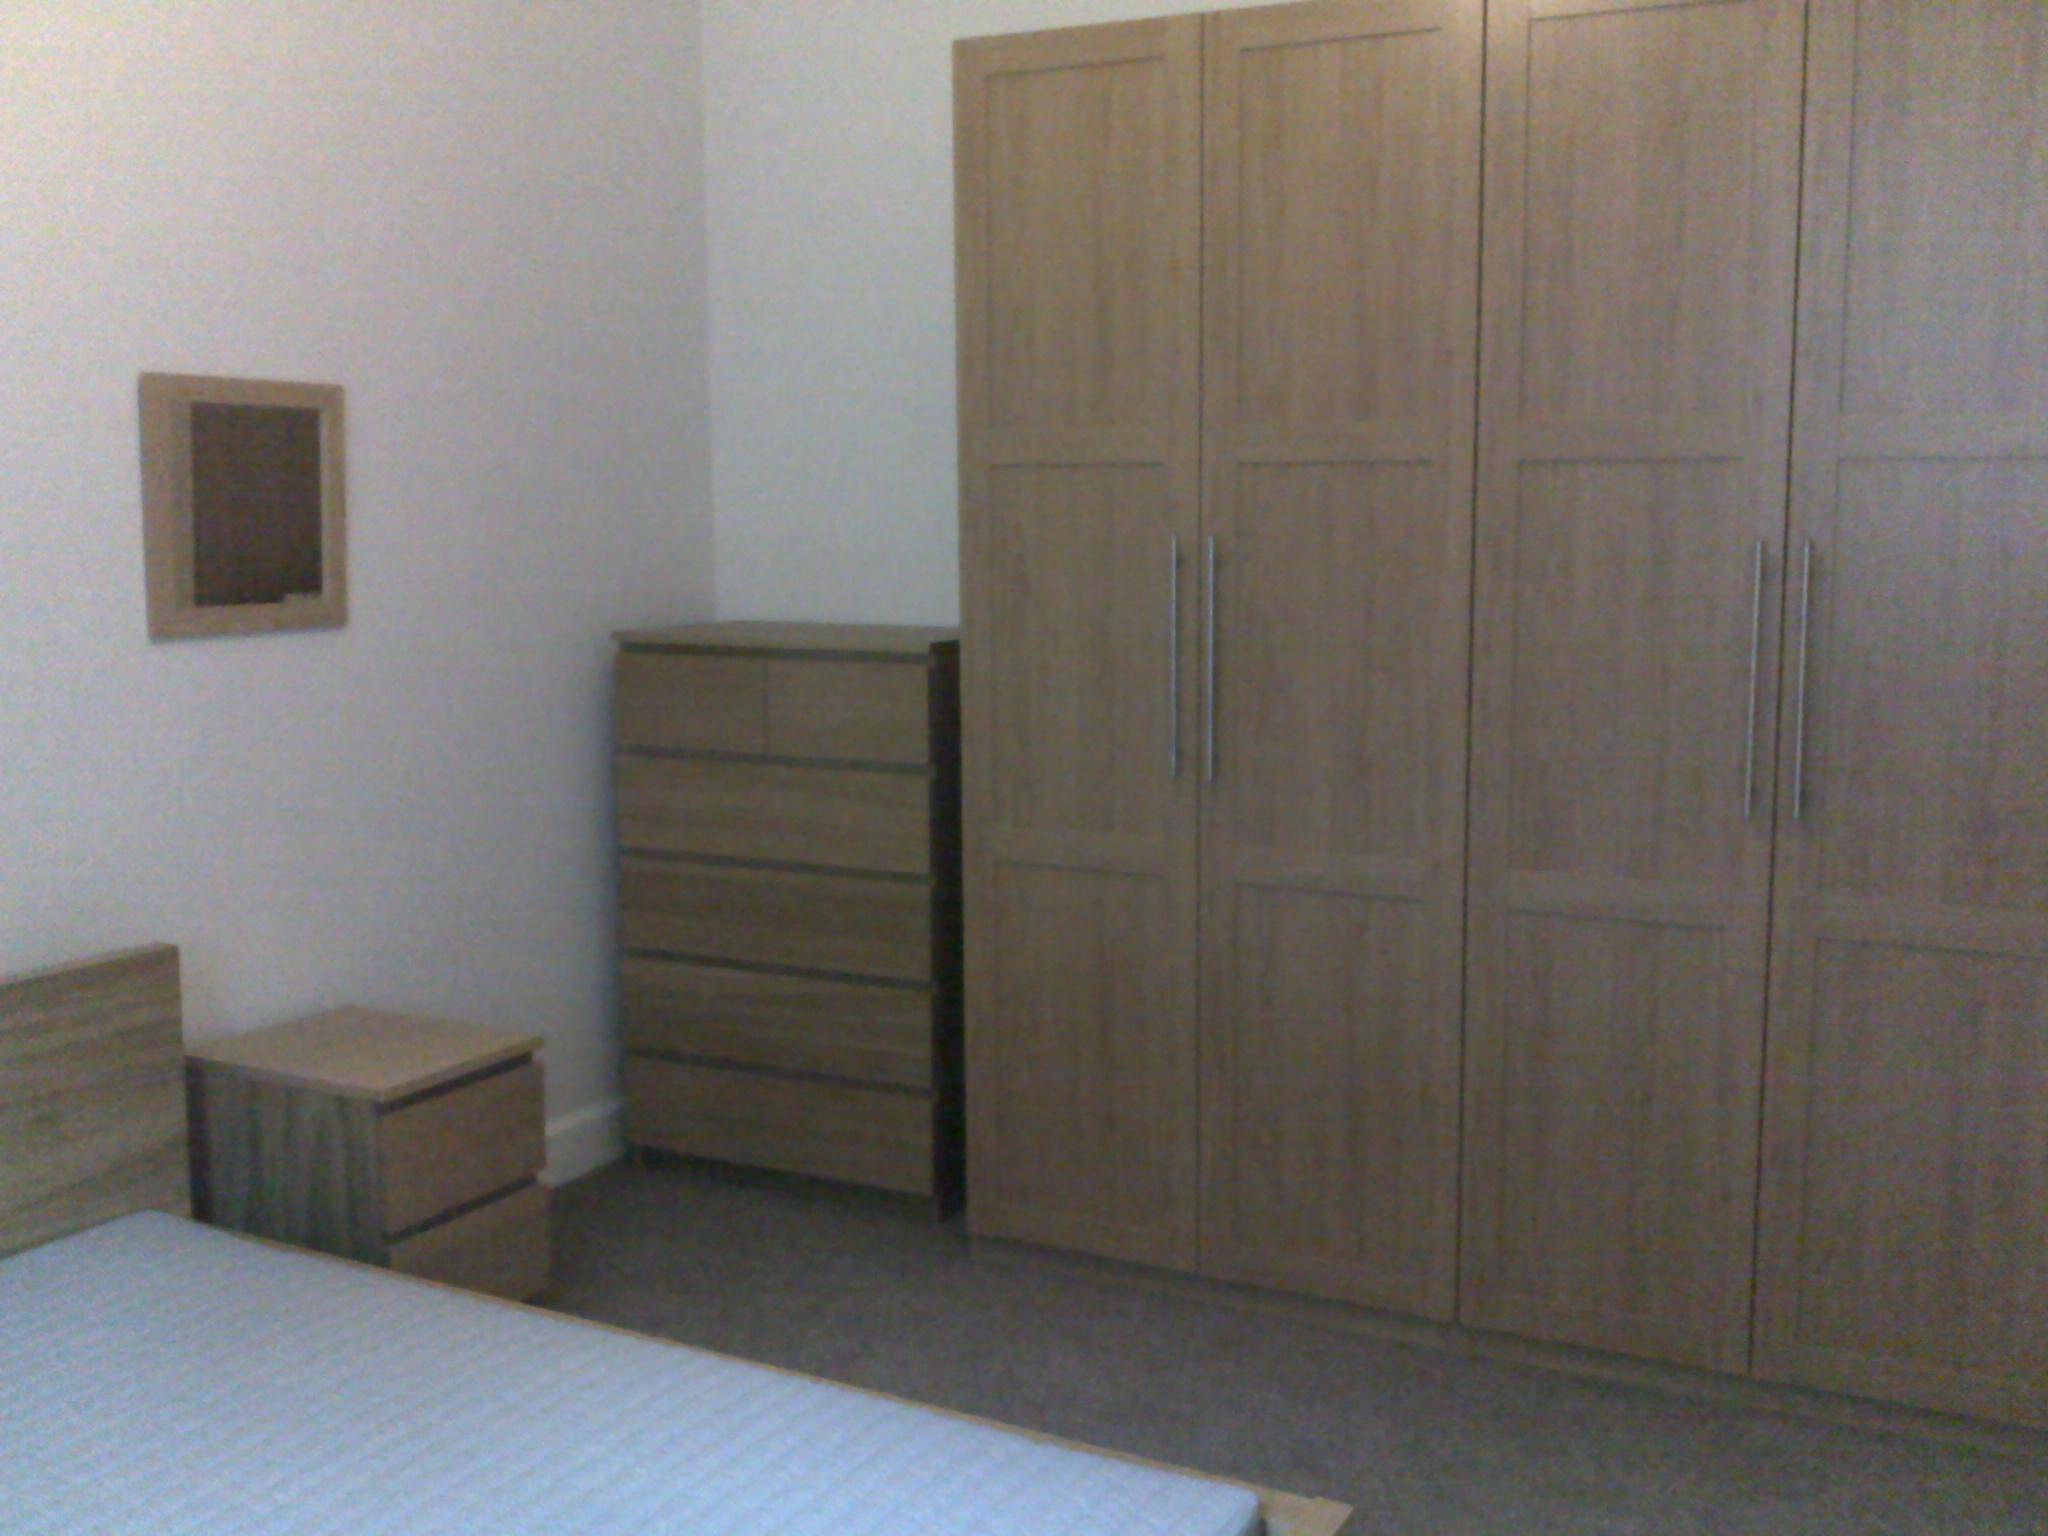 Lochrin Place 16 1f2 Bedroom 3